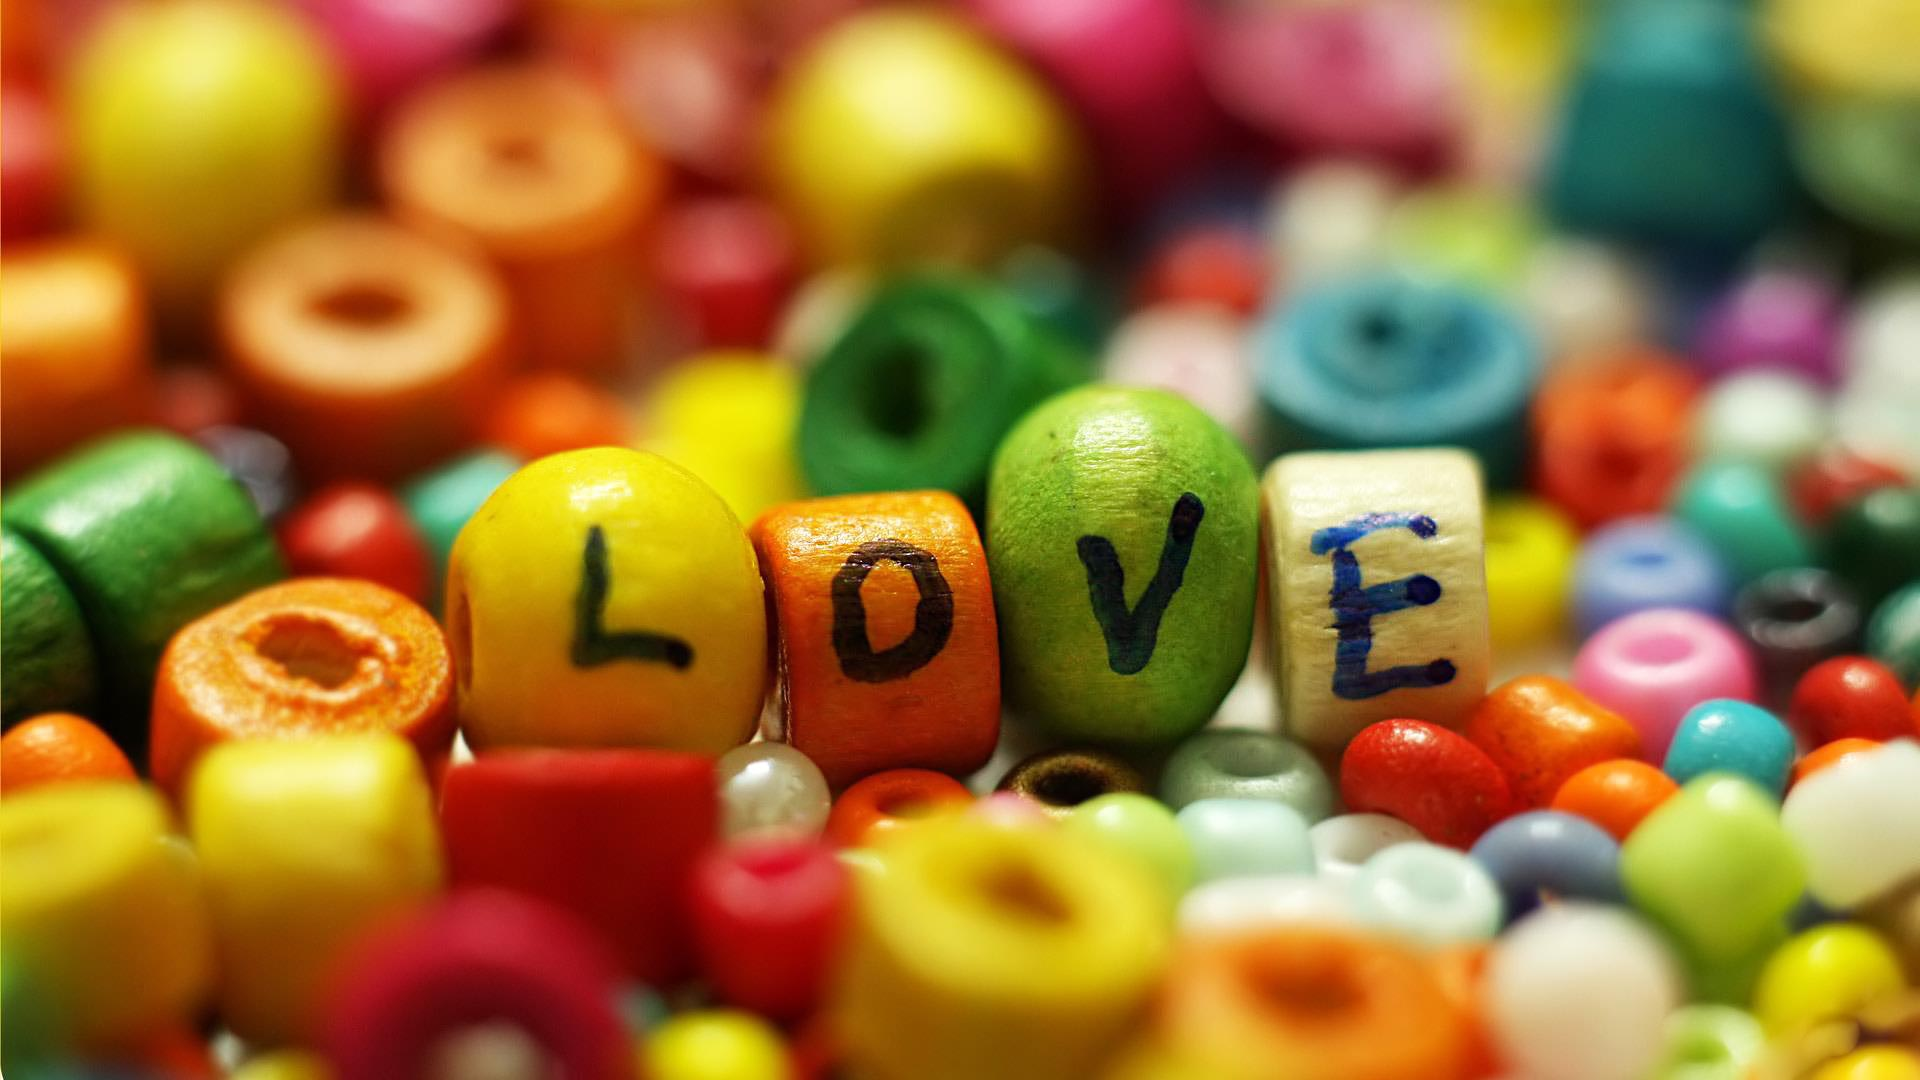 Hd Love Wallpapers Sf Wallpaper